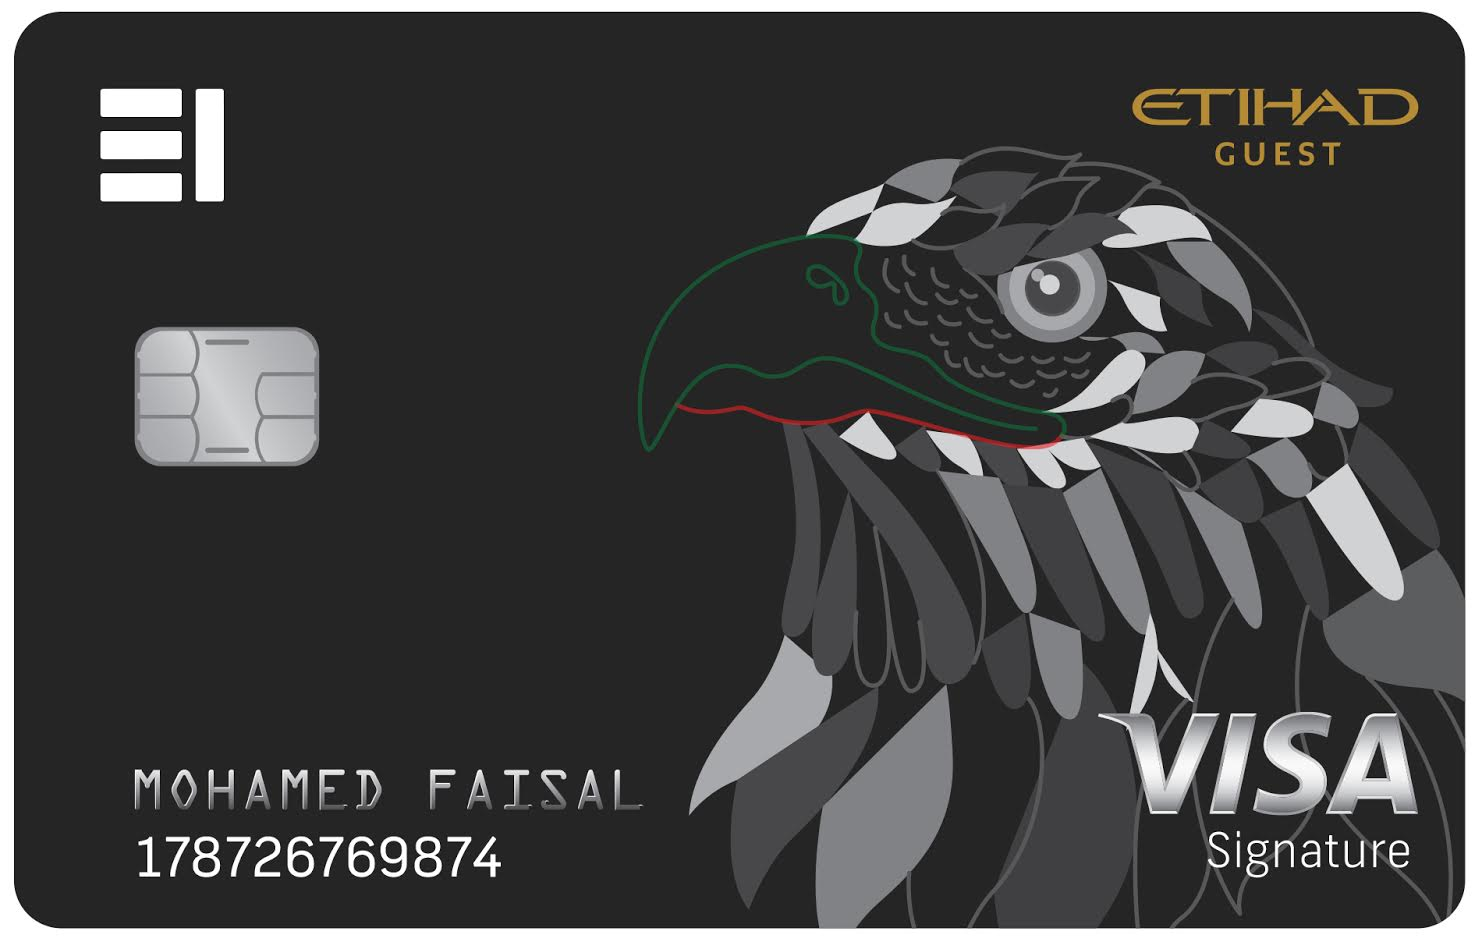 Emirates Islamic - Etihad Guest Saqer Credit Card